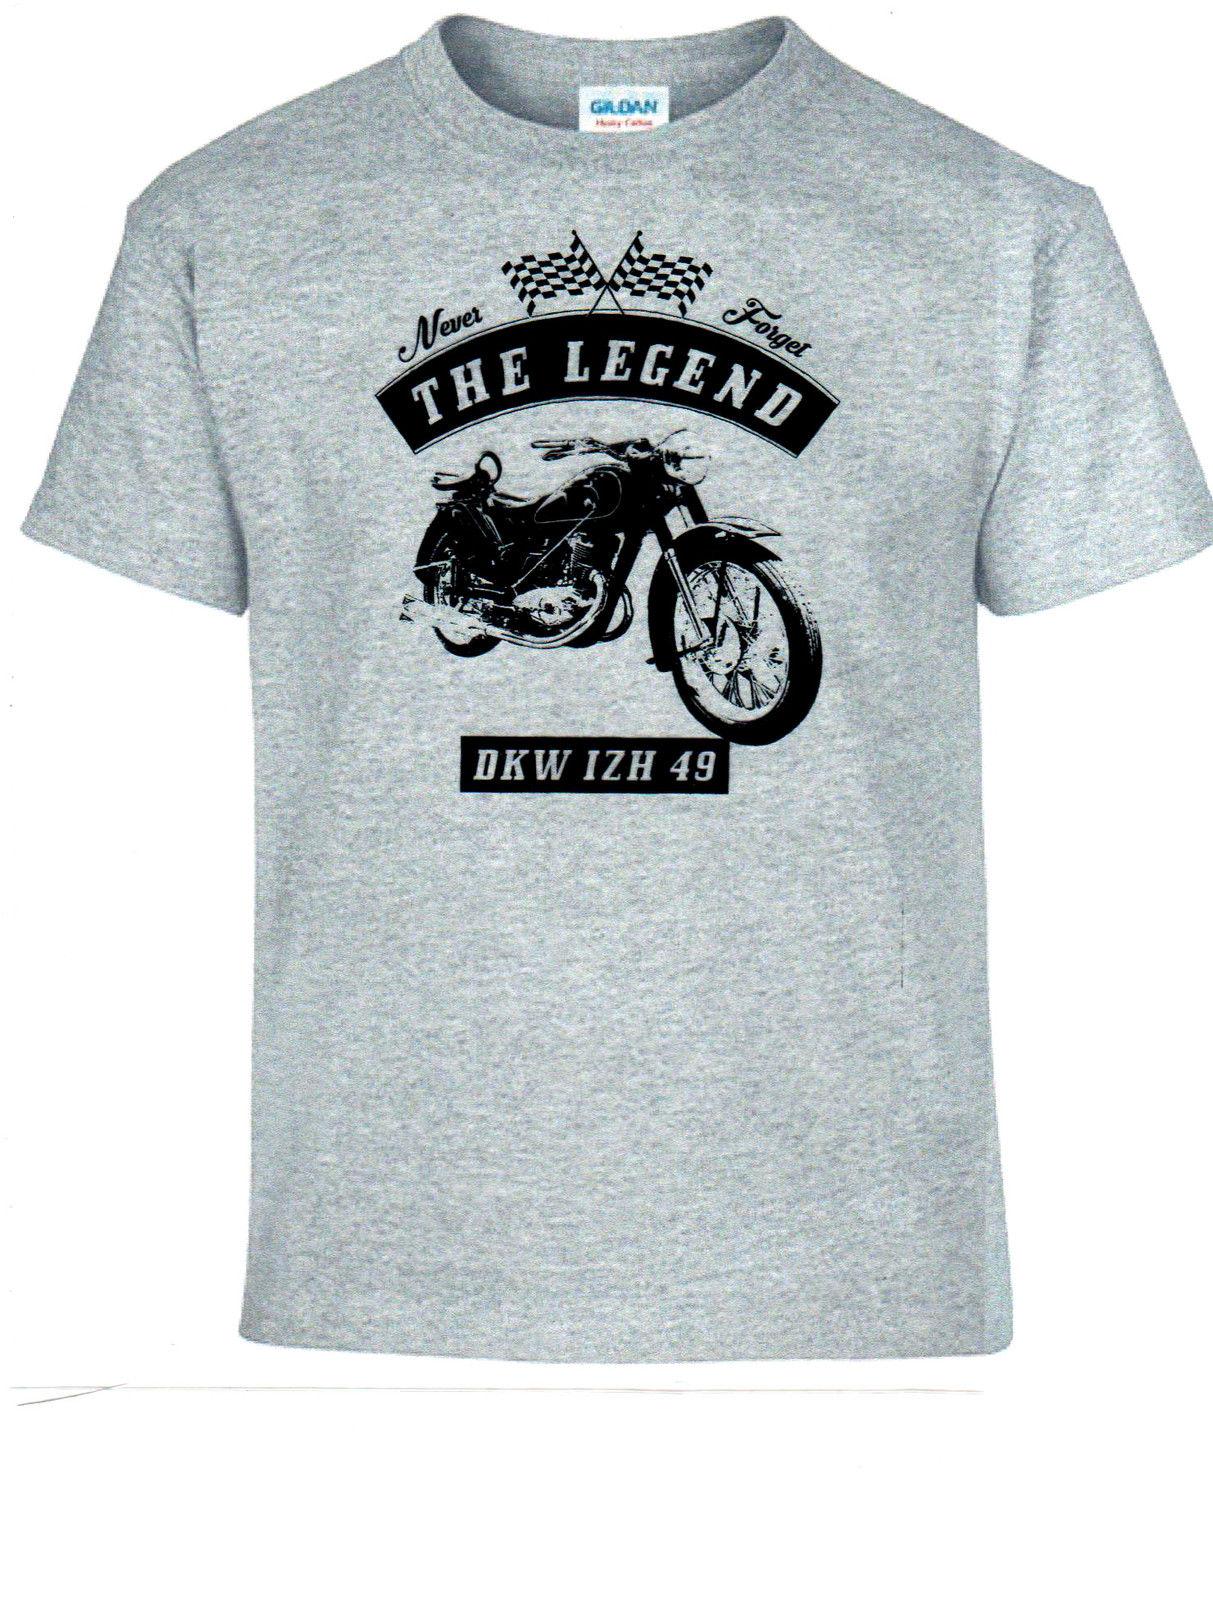 Camiseta, DKW IZH 49, bicicleta, motocicleta, Vintage, coches clásicos